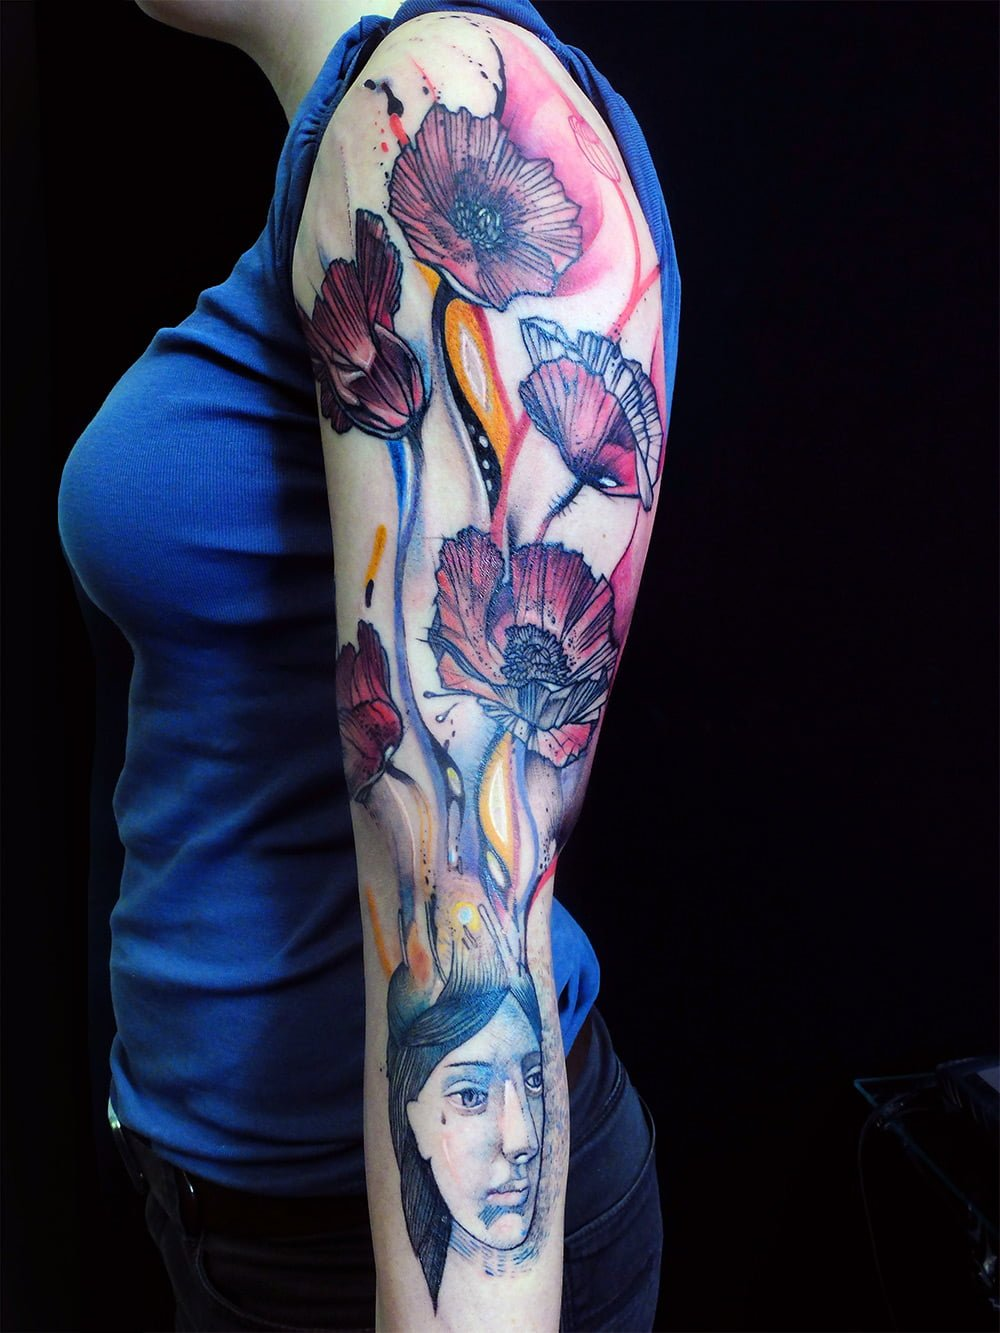 Tatuaje de mujer con amapolas